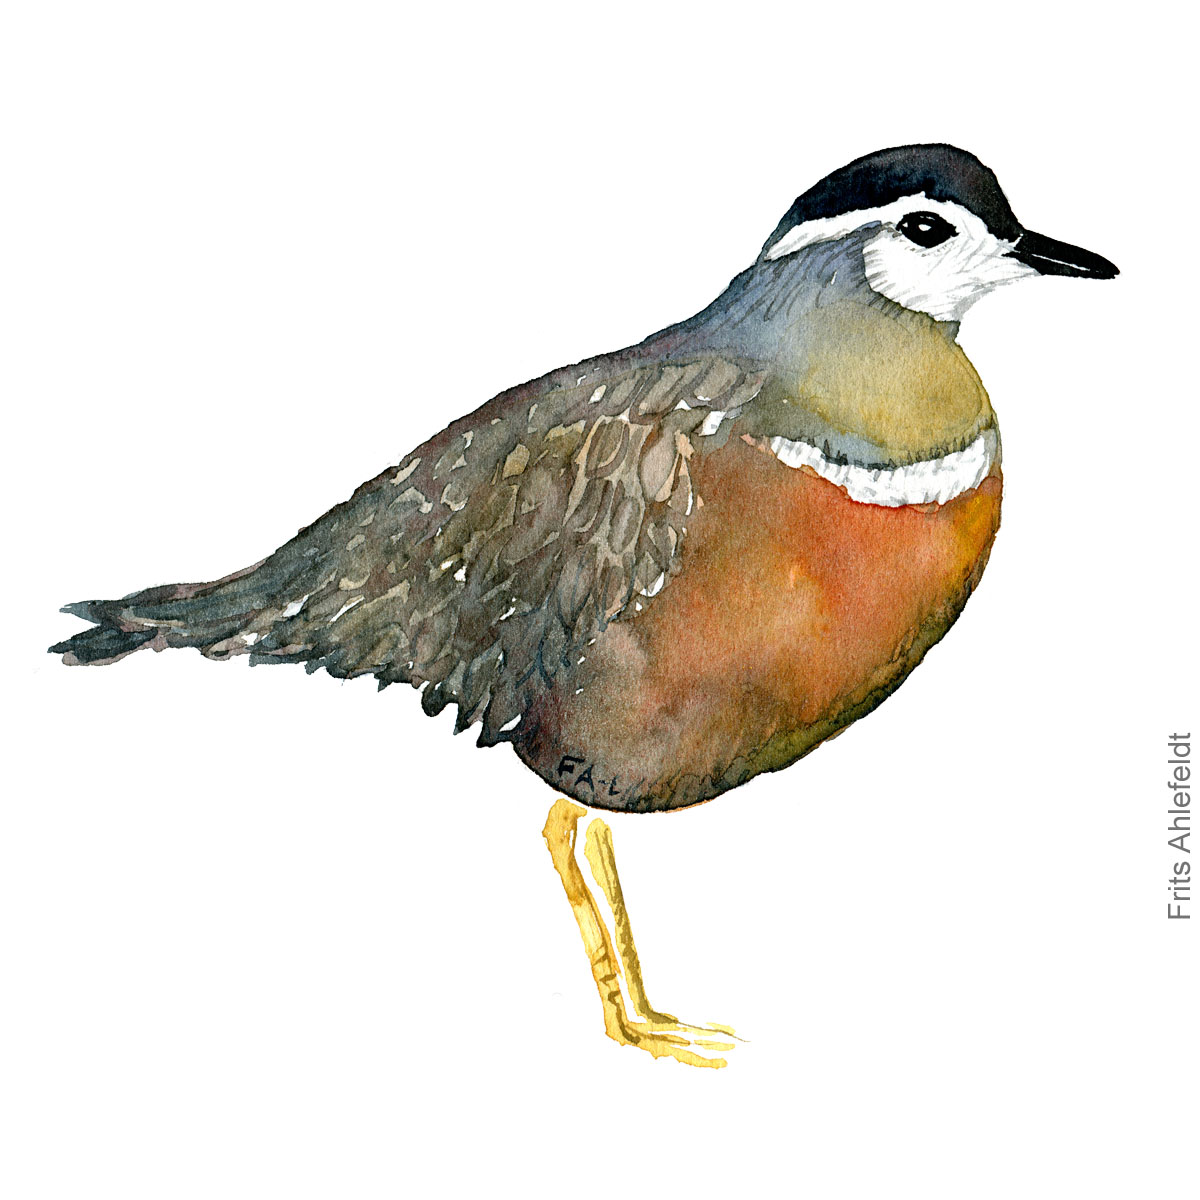 Pomeransfugl female. Eurasian dotterel bird watercolor painting. Artwork by Frits Ahlefeldt. Fugle akvarel